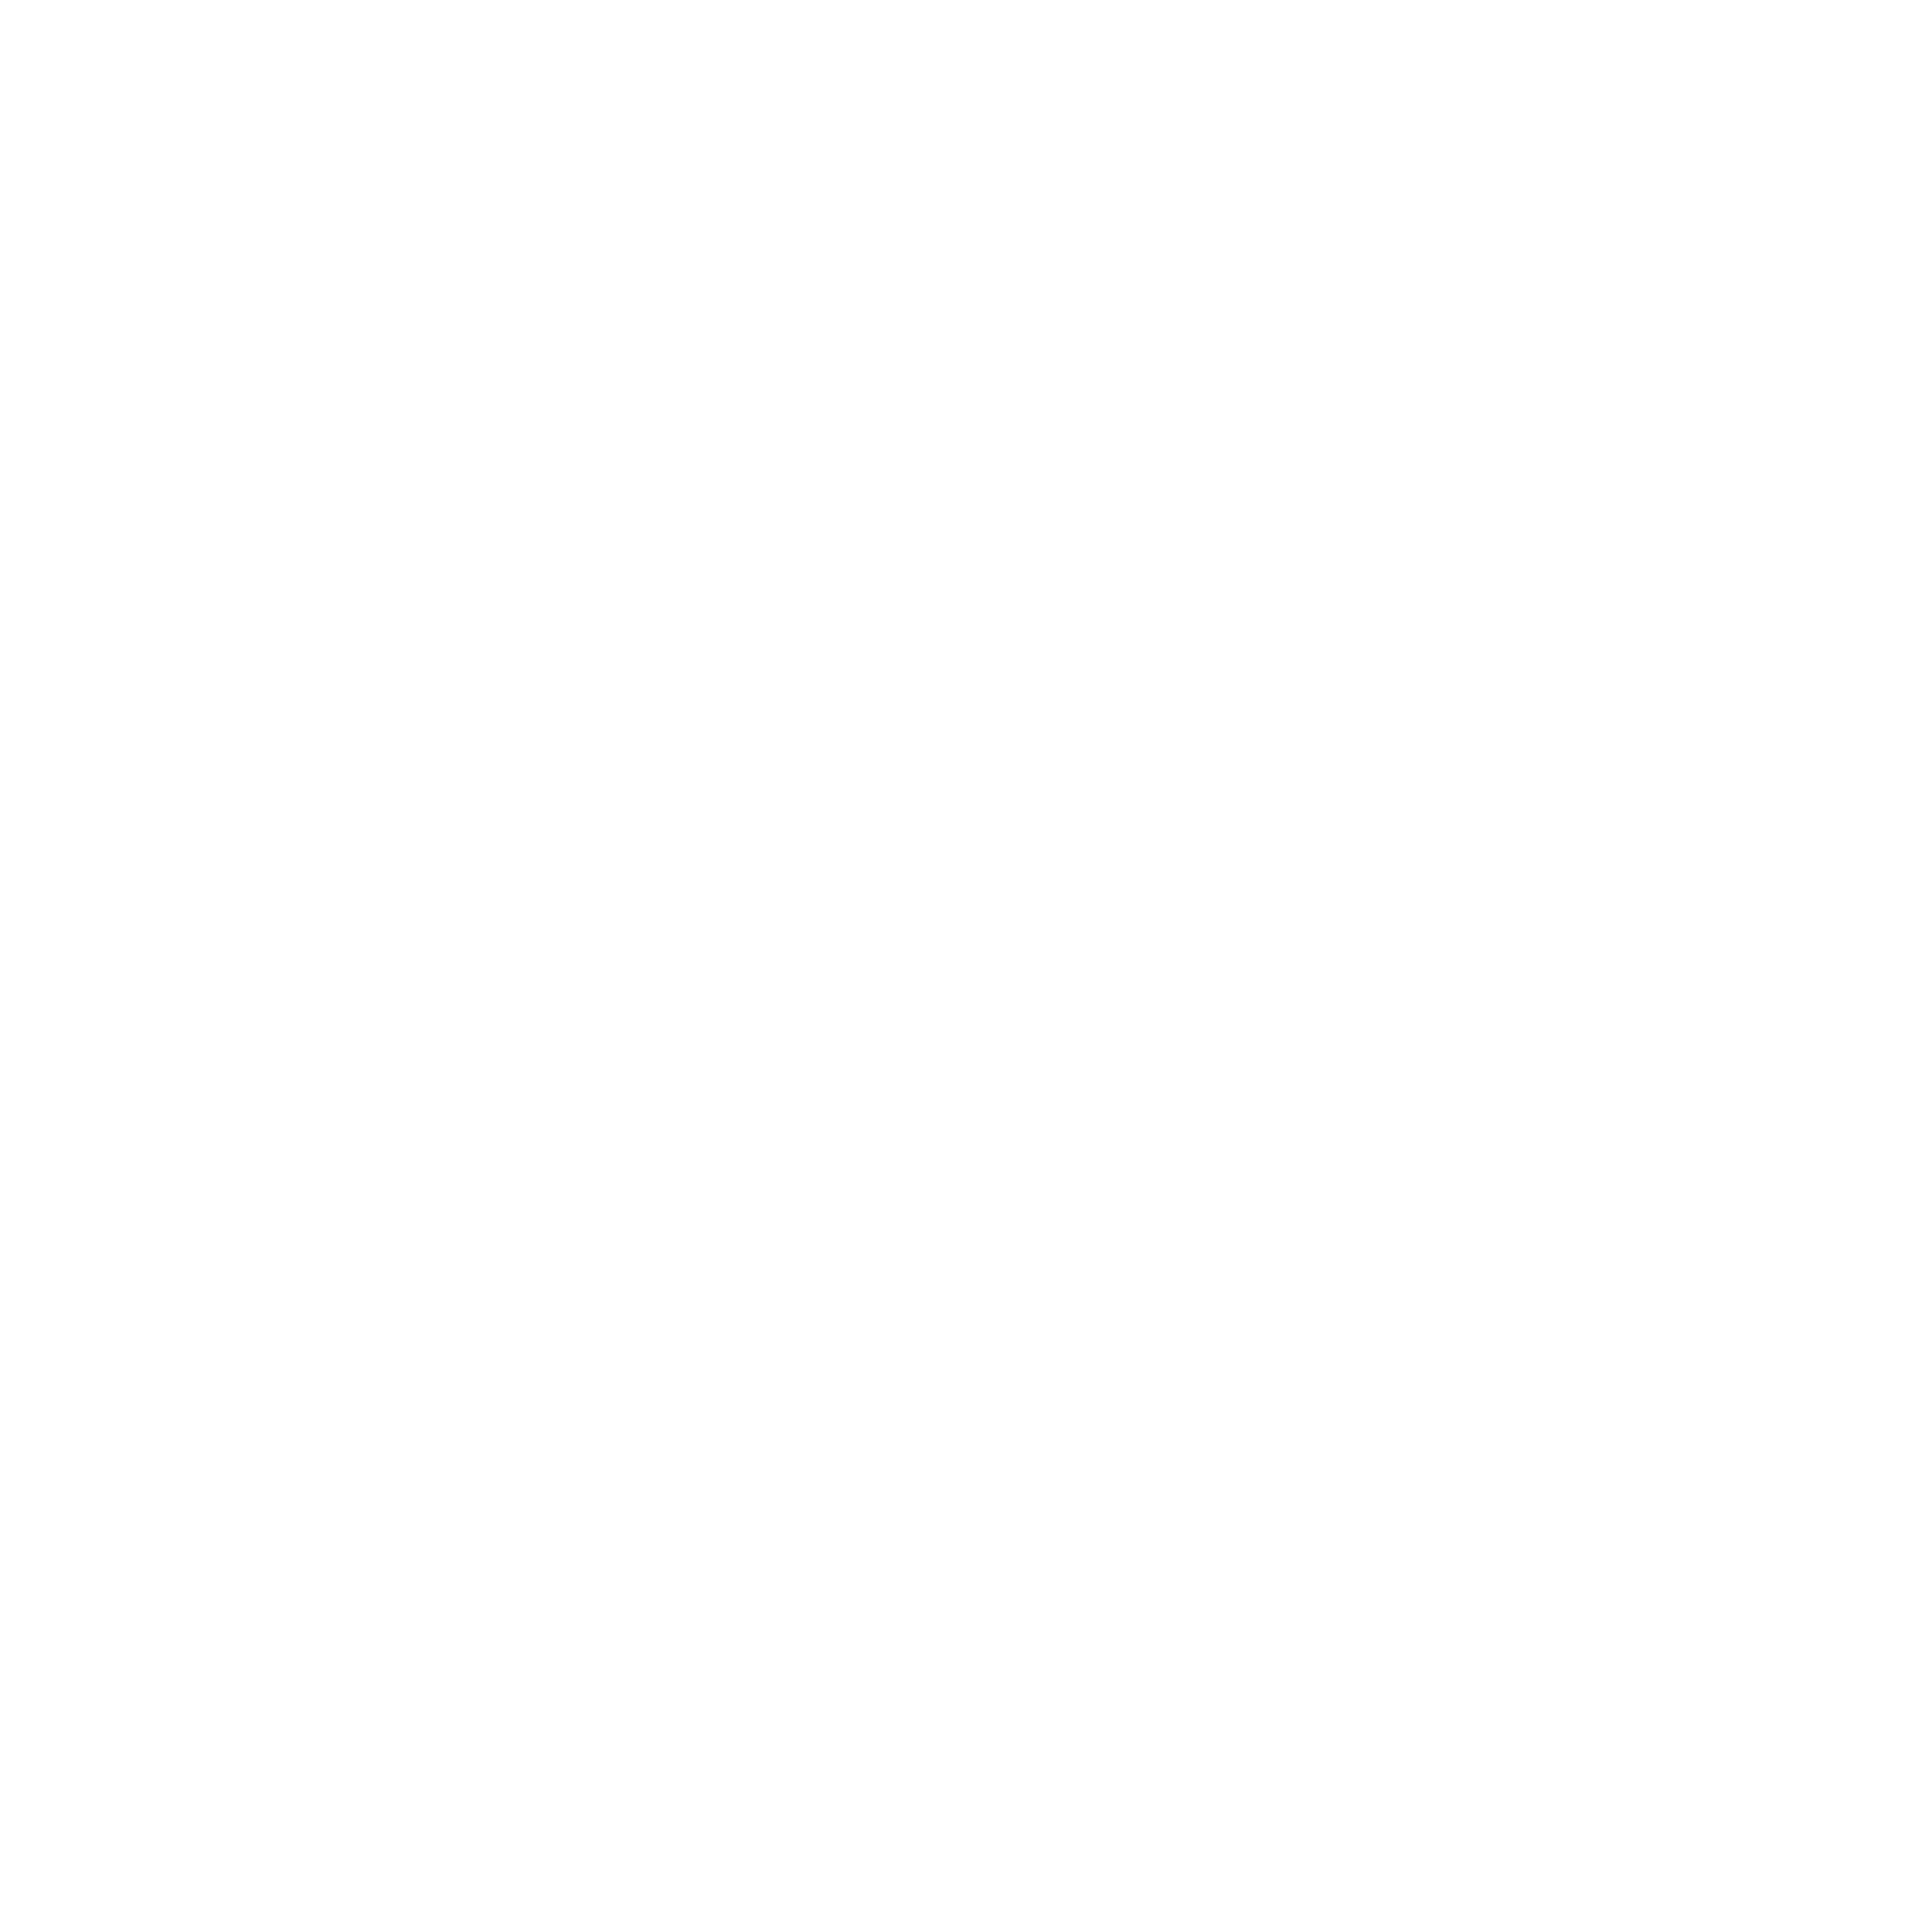 Consciouscreation symbol conscious creation consciousness community consciousness pioneer who explores new realms of consciousness and awareness break out of mass consciousness limitations buycottarizona